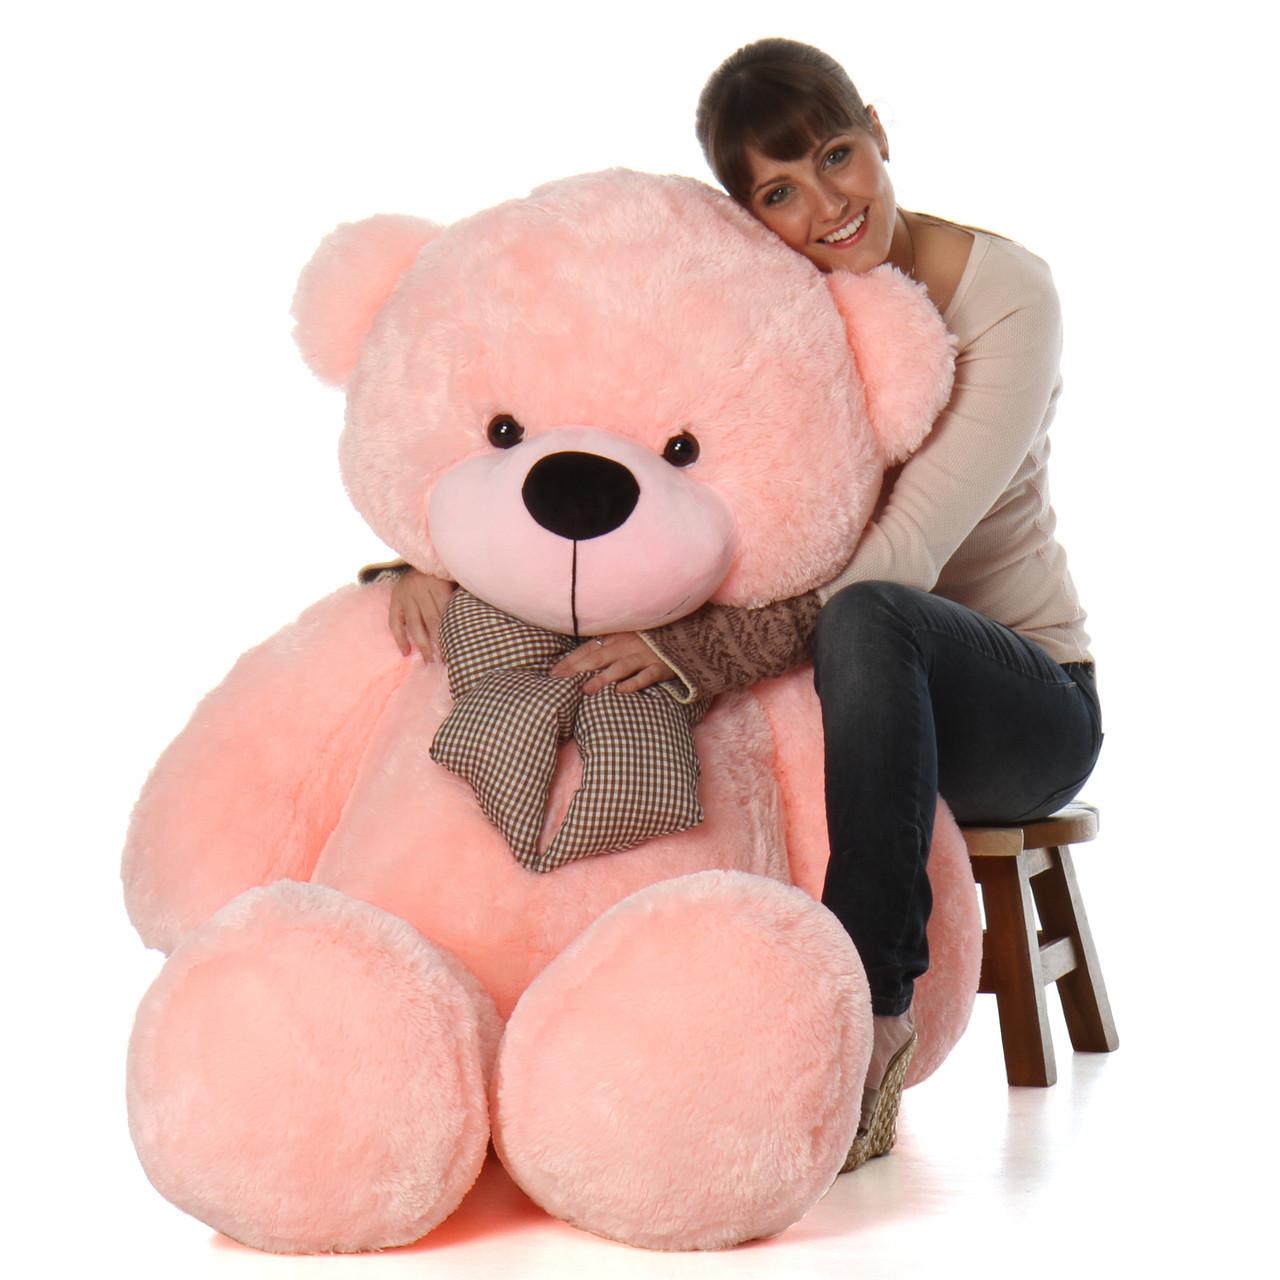 decc283d810 5 Foot Soft Pink Teddy Bear Huge Life Size Plush Teddy Bear Toy Sweet Lady  Cuddles